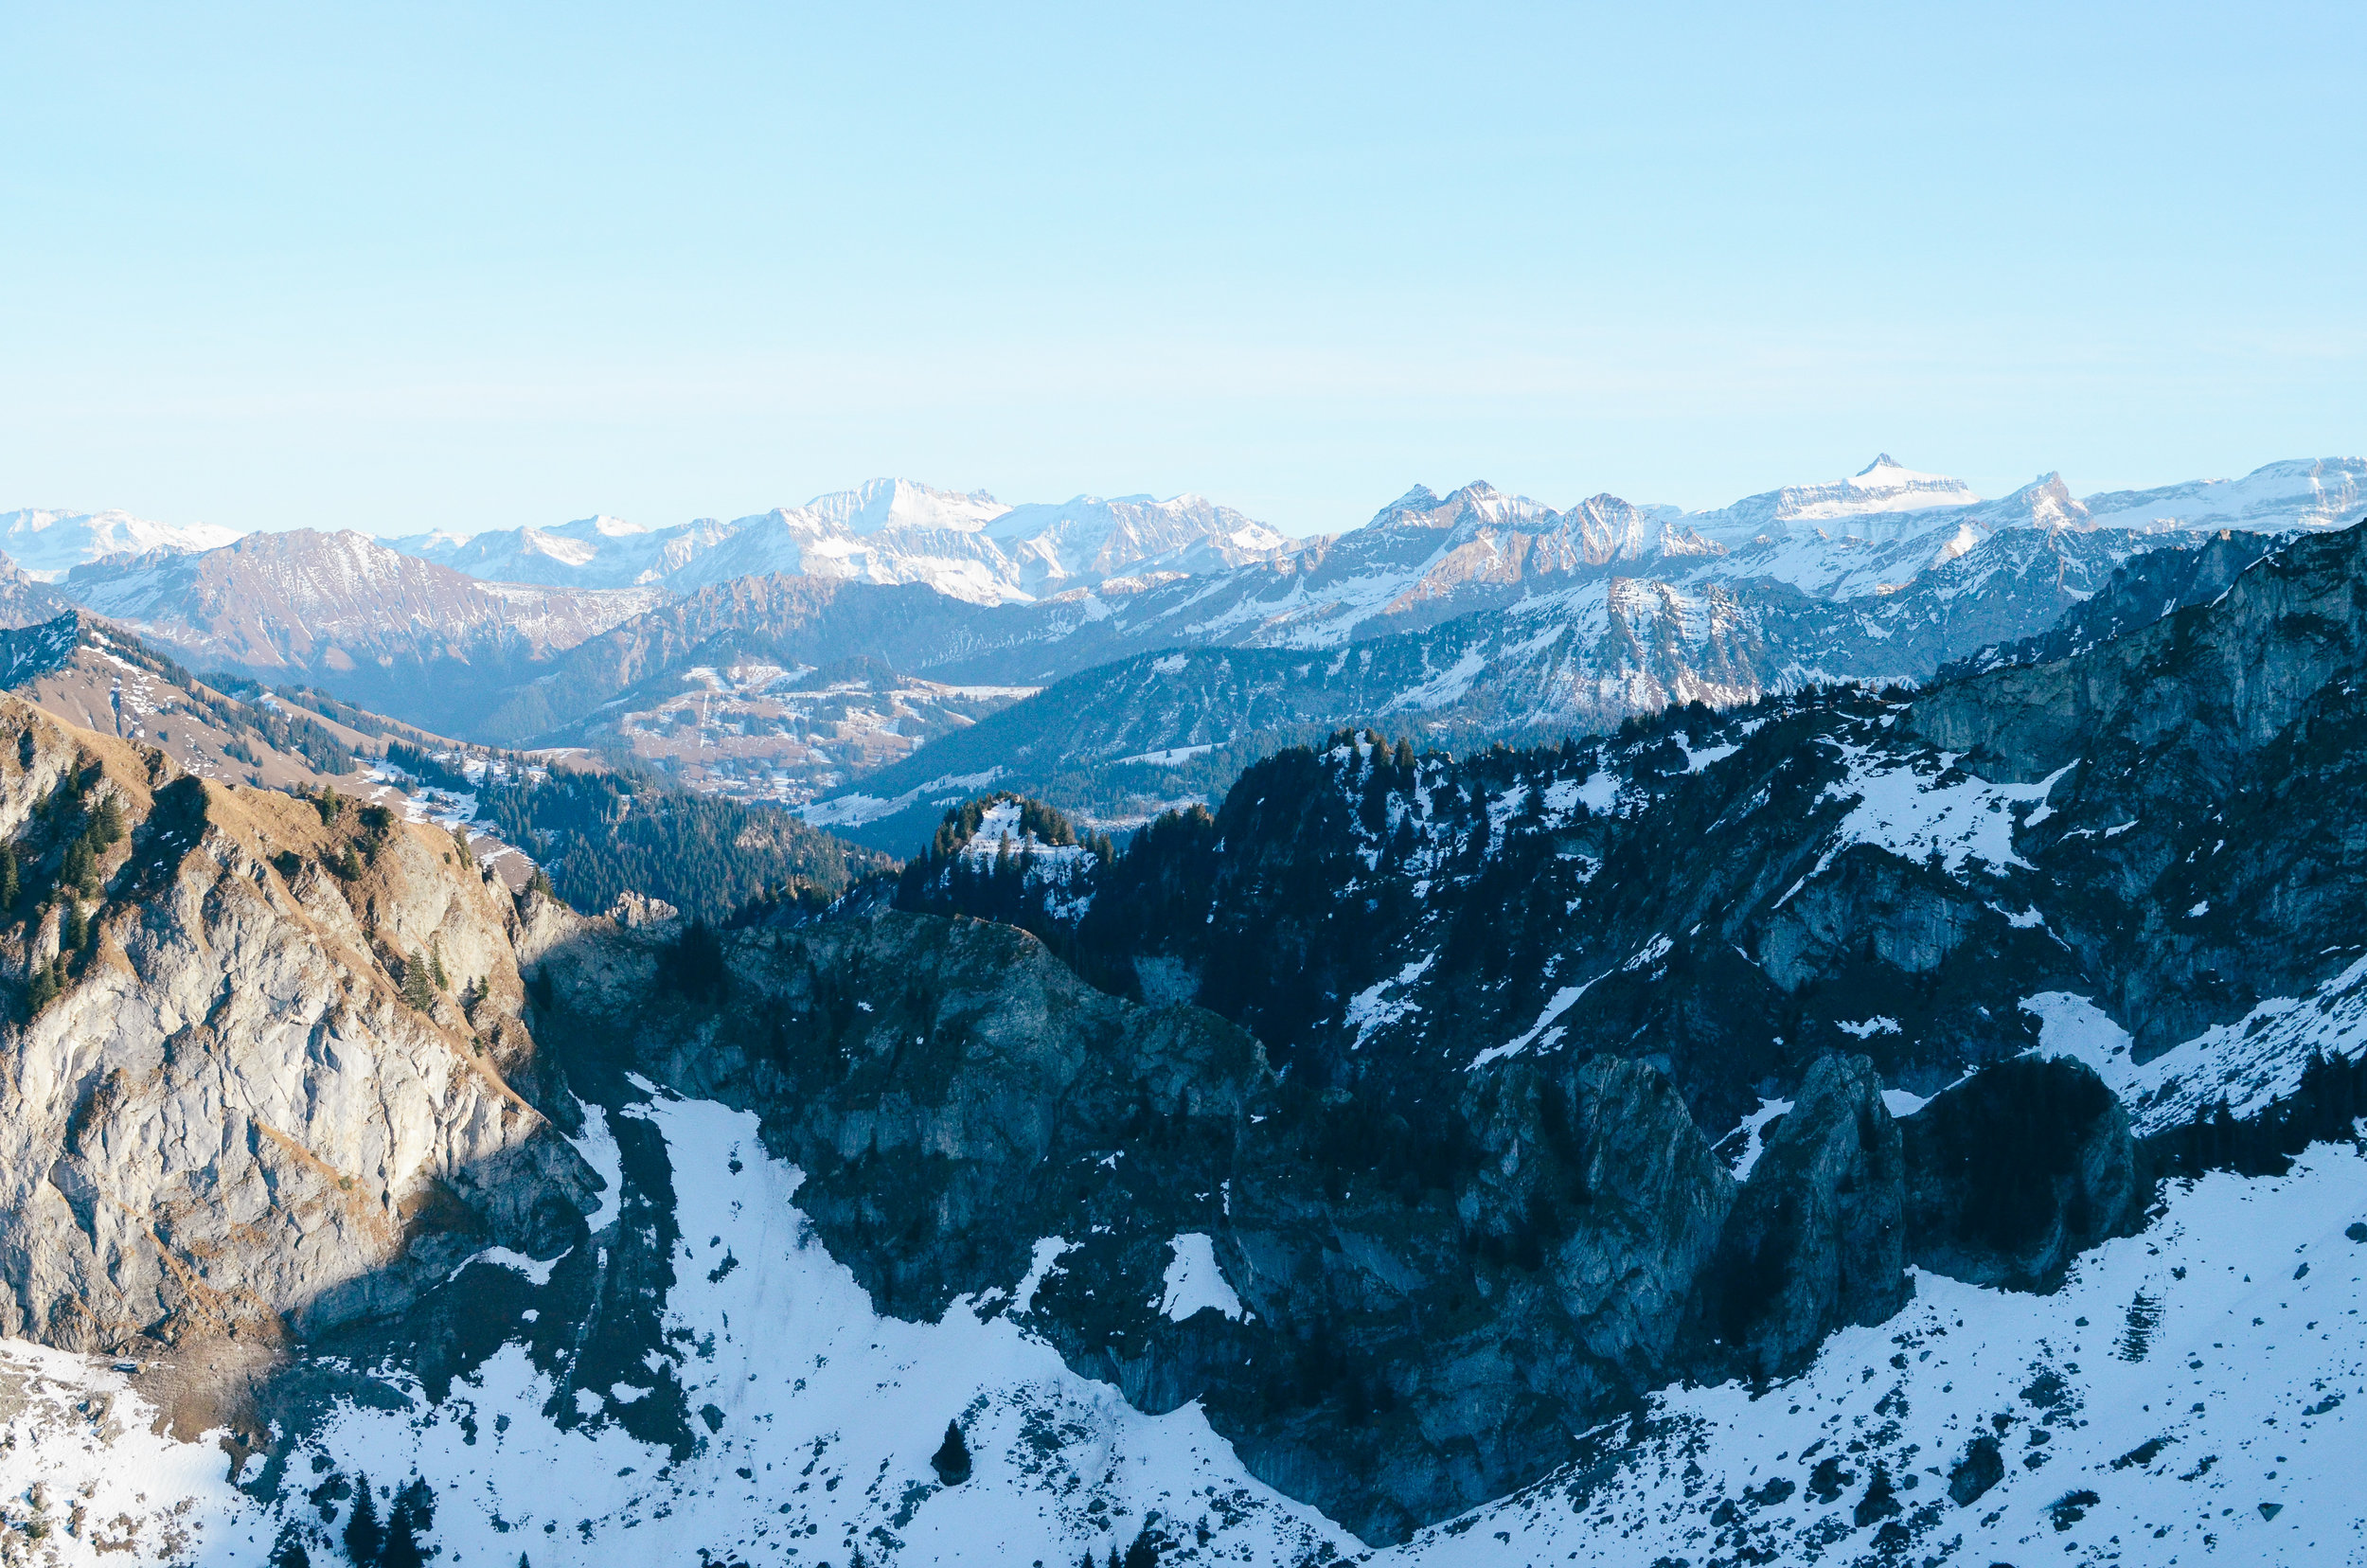 Switzerland-Day-Trips-From-Geneva-LifeOnPine_DSC_0674.jpg